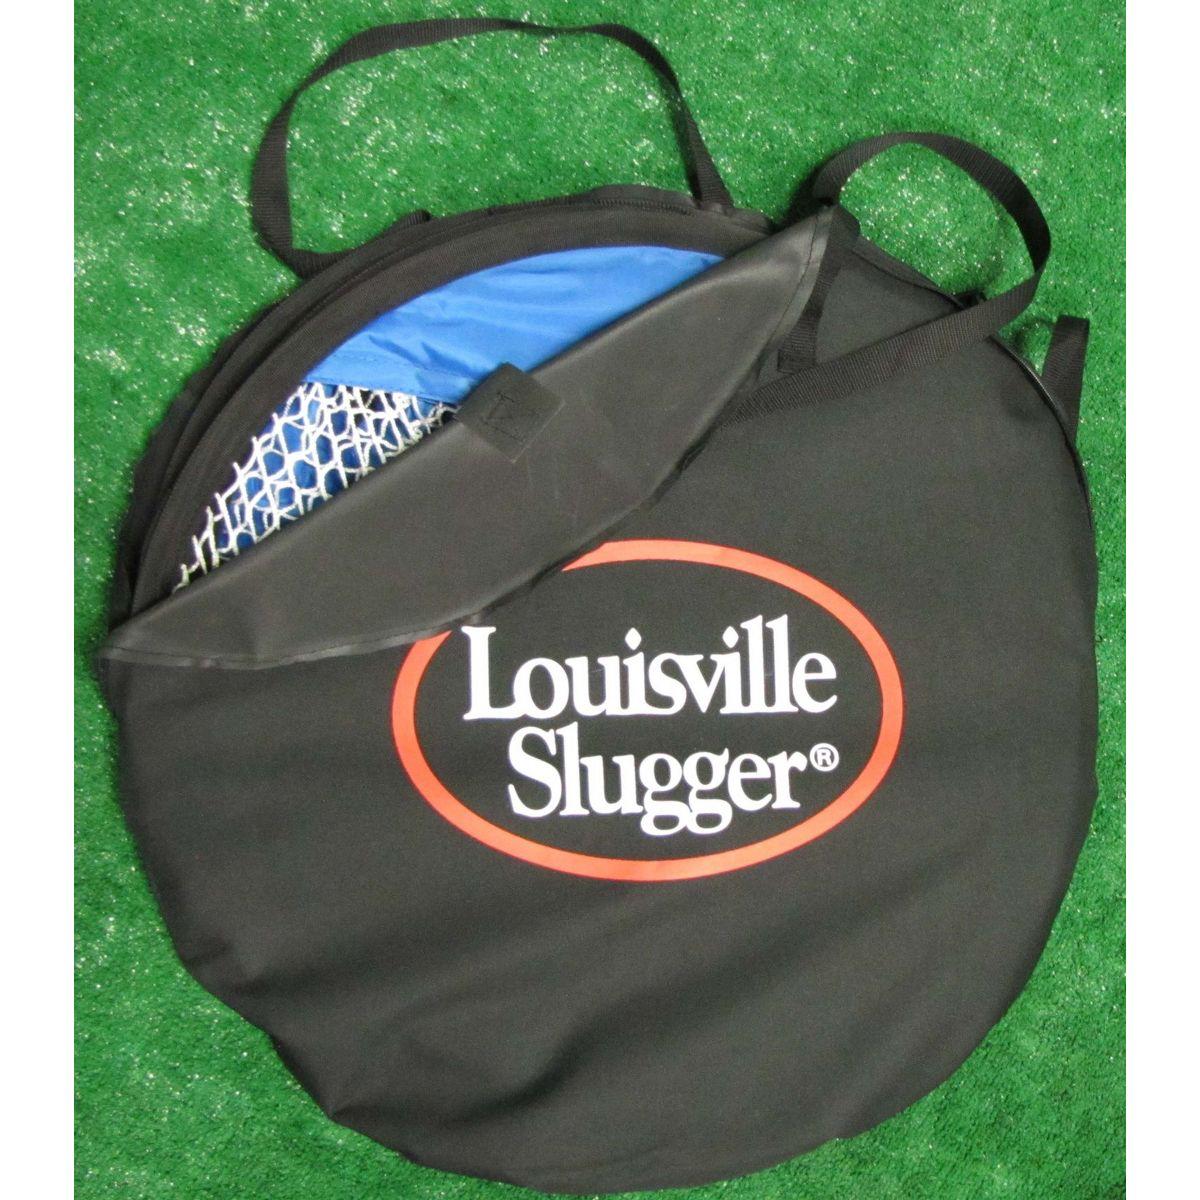 Louisville Slugger All Purpoas 5 Pop UP Net Bag